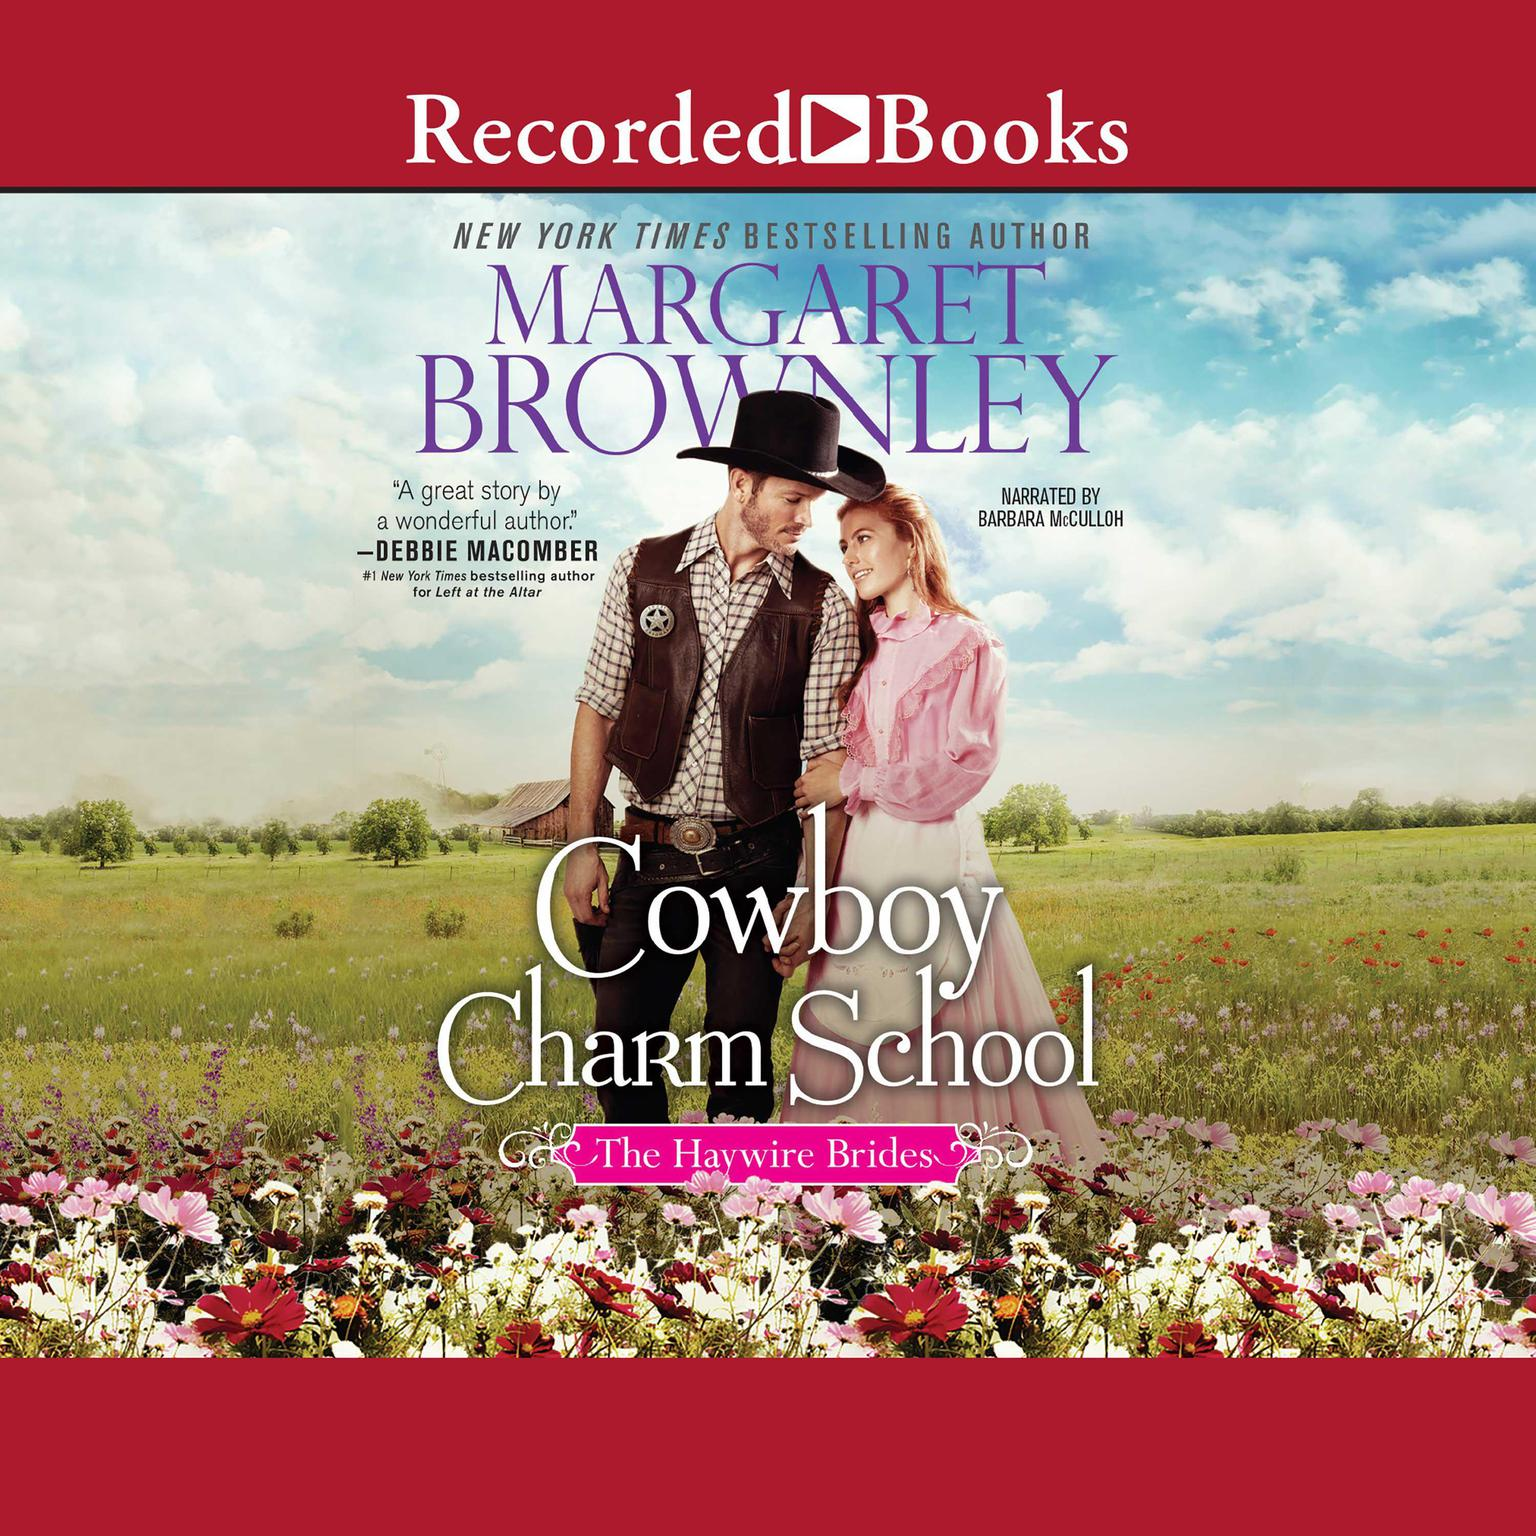 Cowboy Charm School Audiobook, by Margaret Brownley